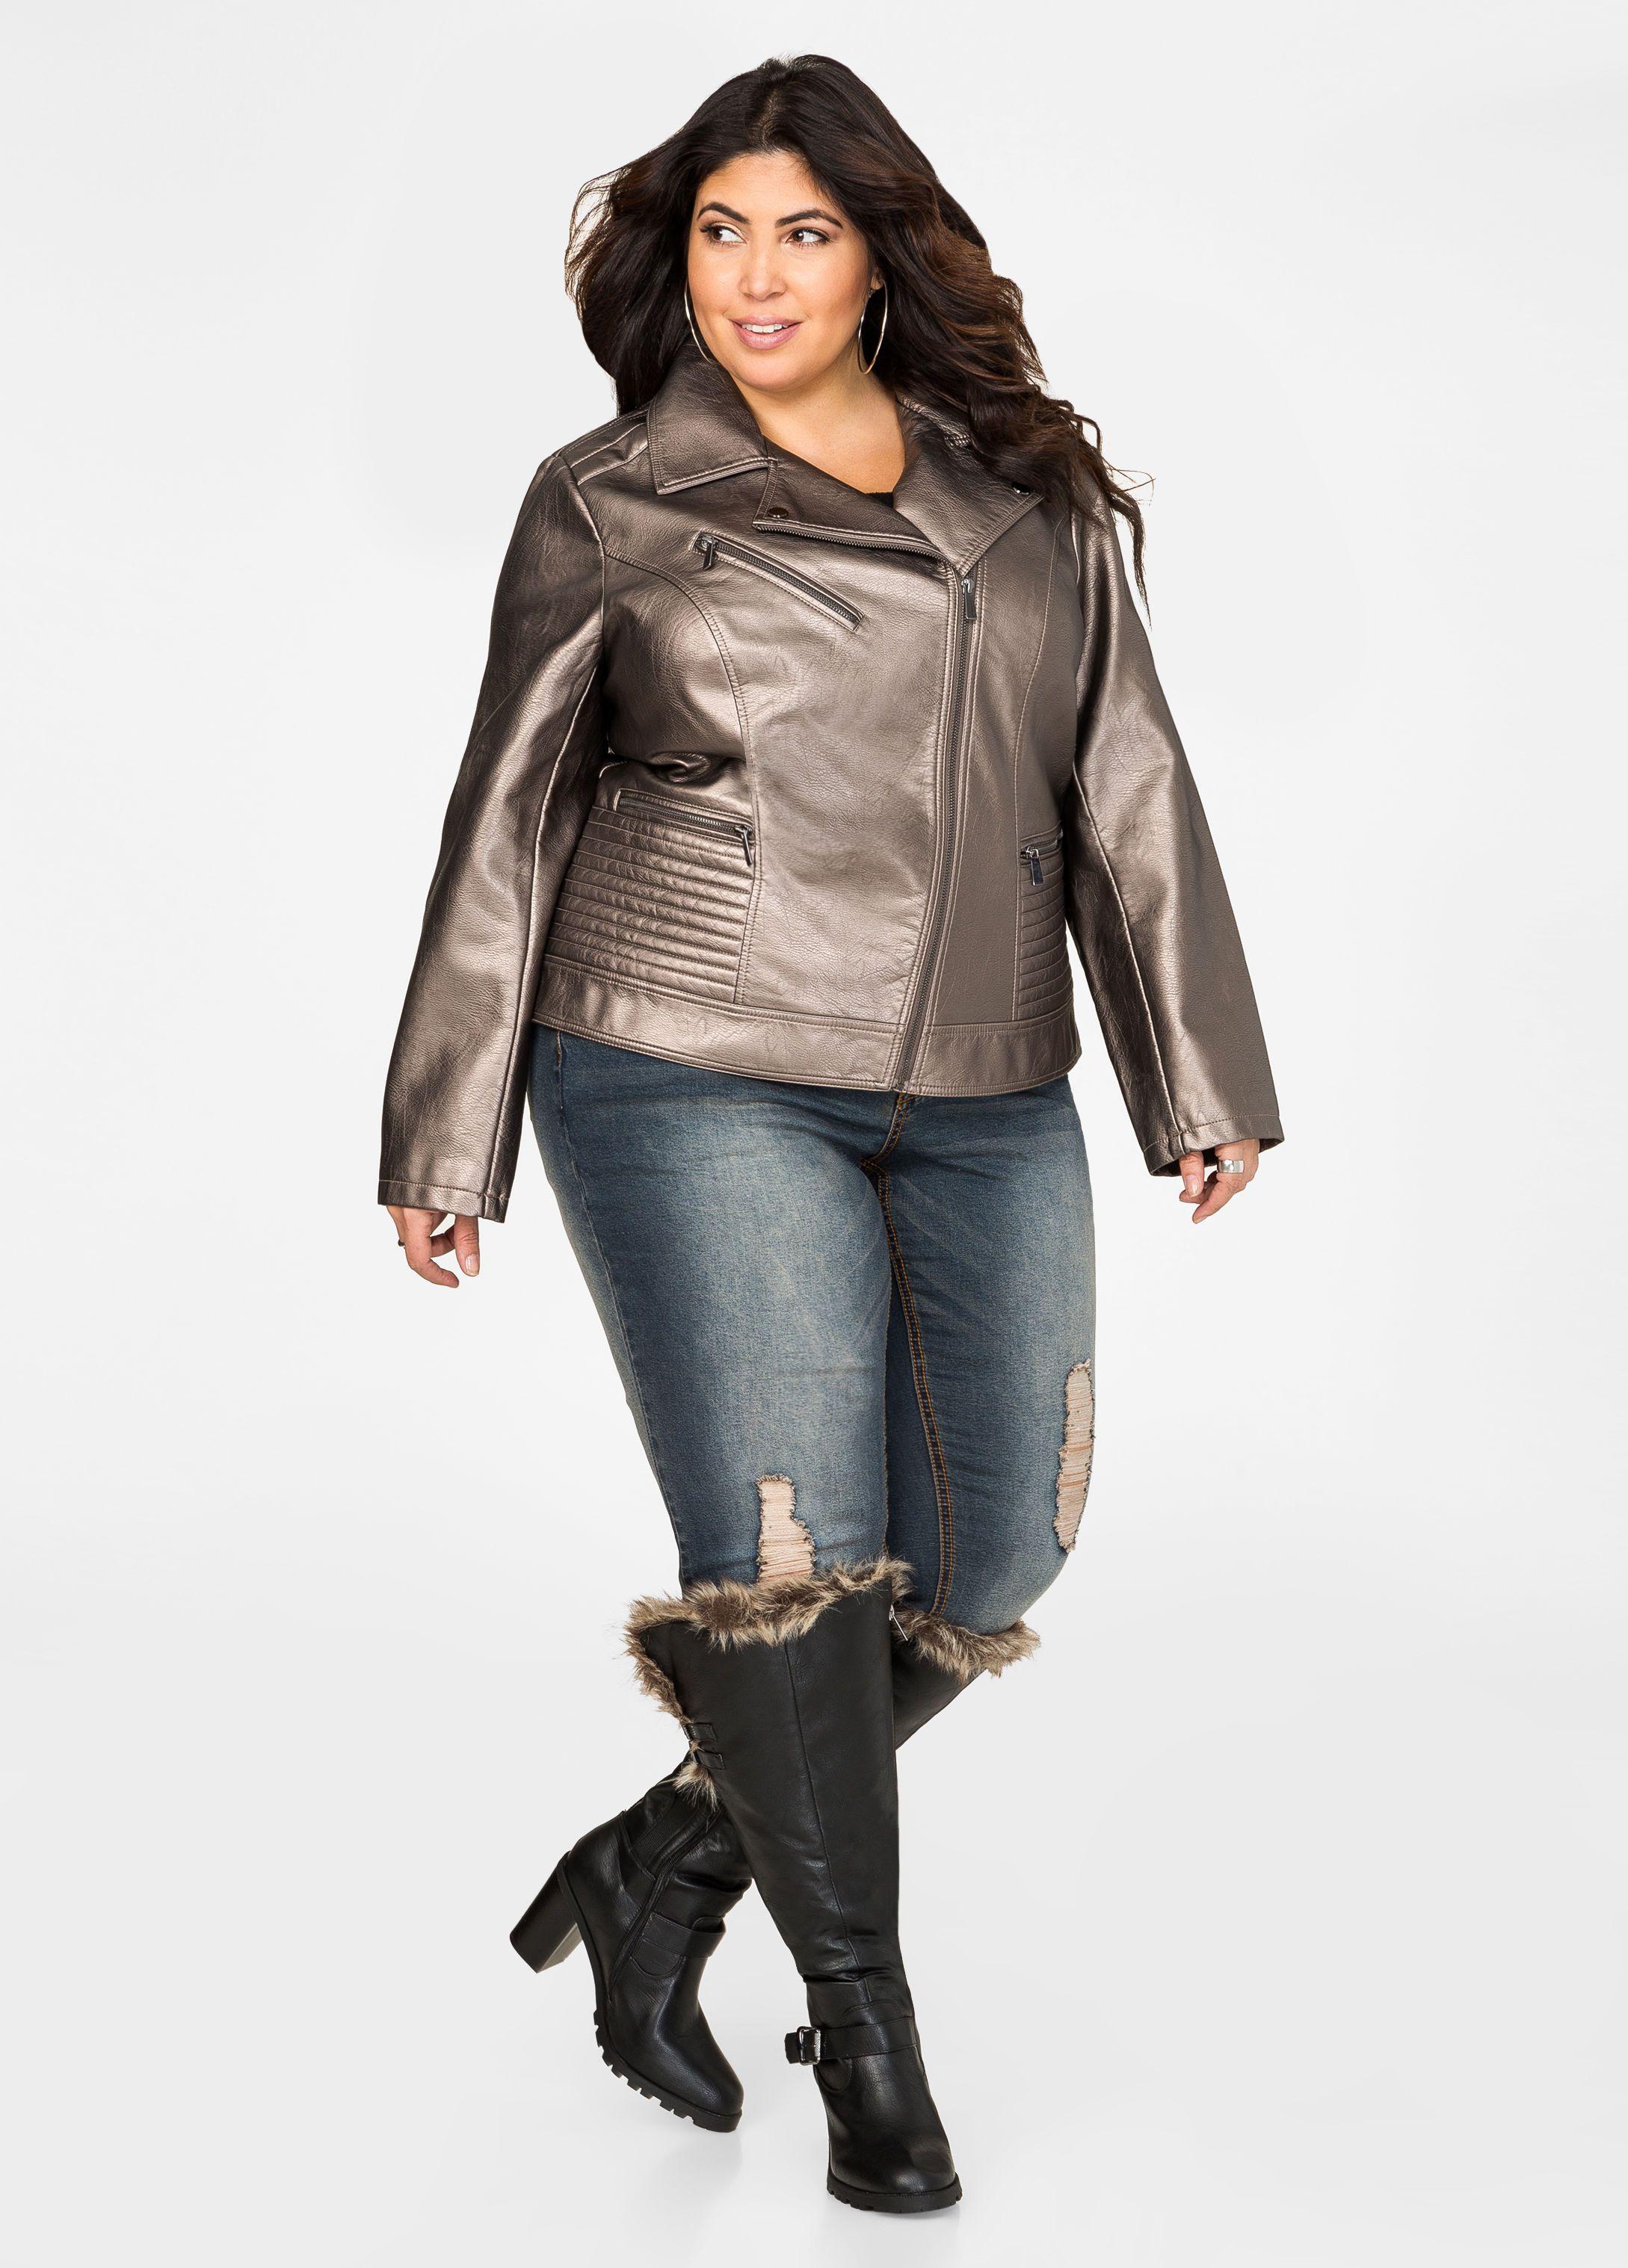 758f52fa2df Chunky Fur Lined Tall Boot - Wide Calf, Wide Width   Jessica ...